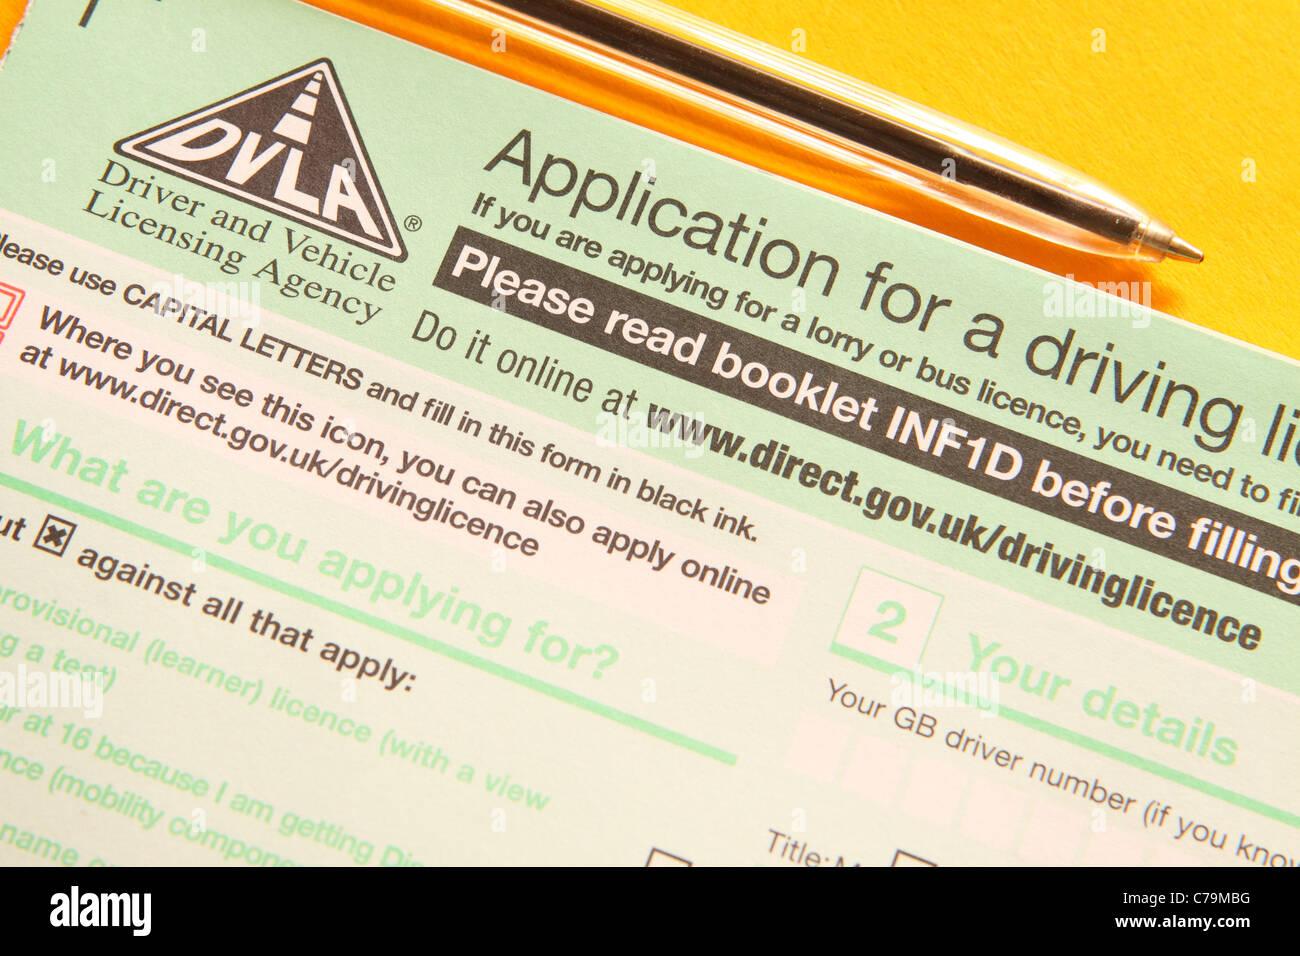 vehicle licence renewal application form